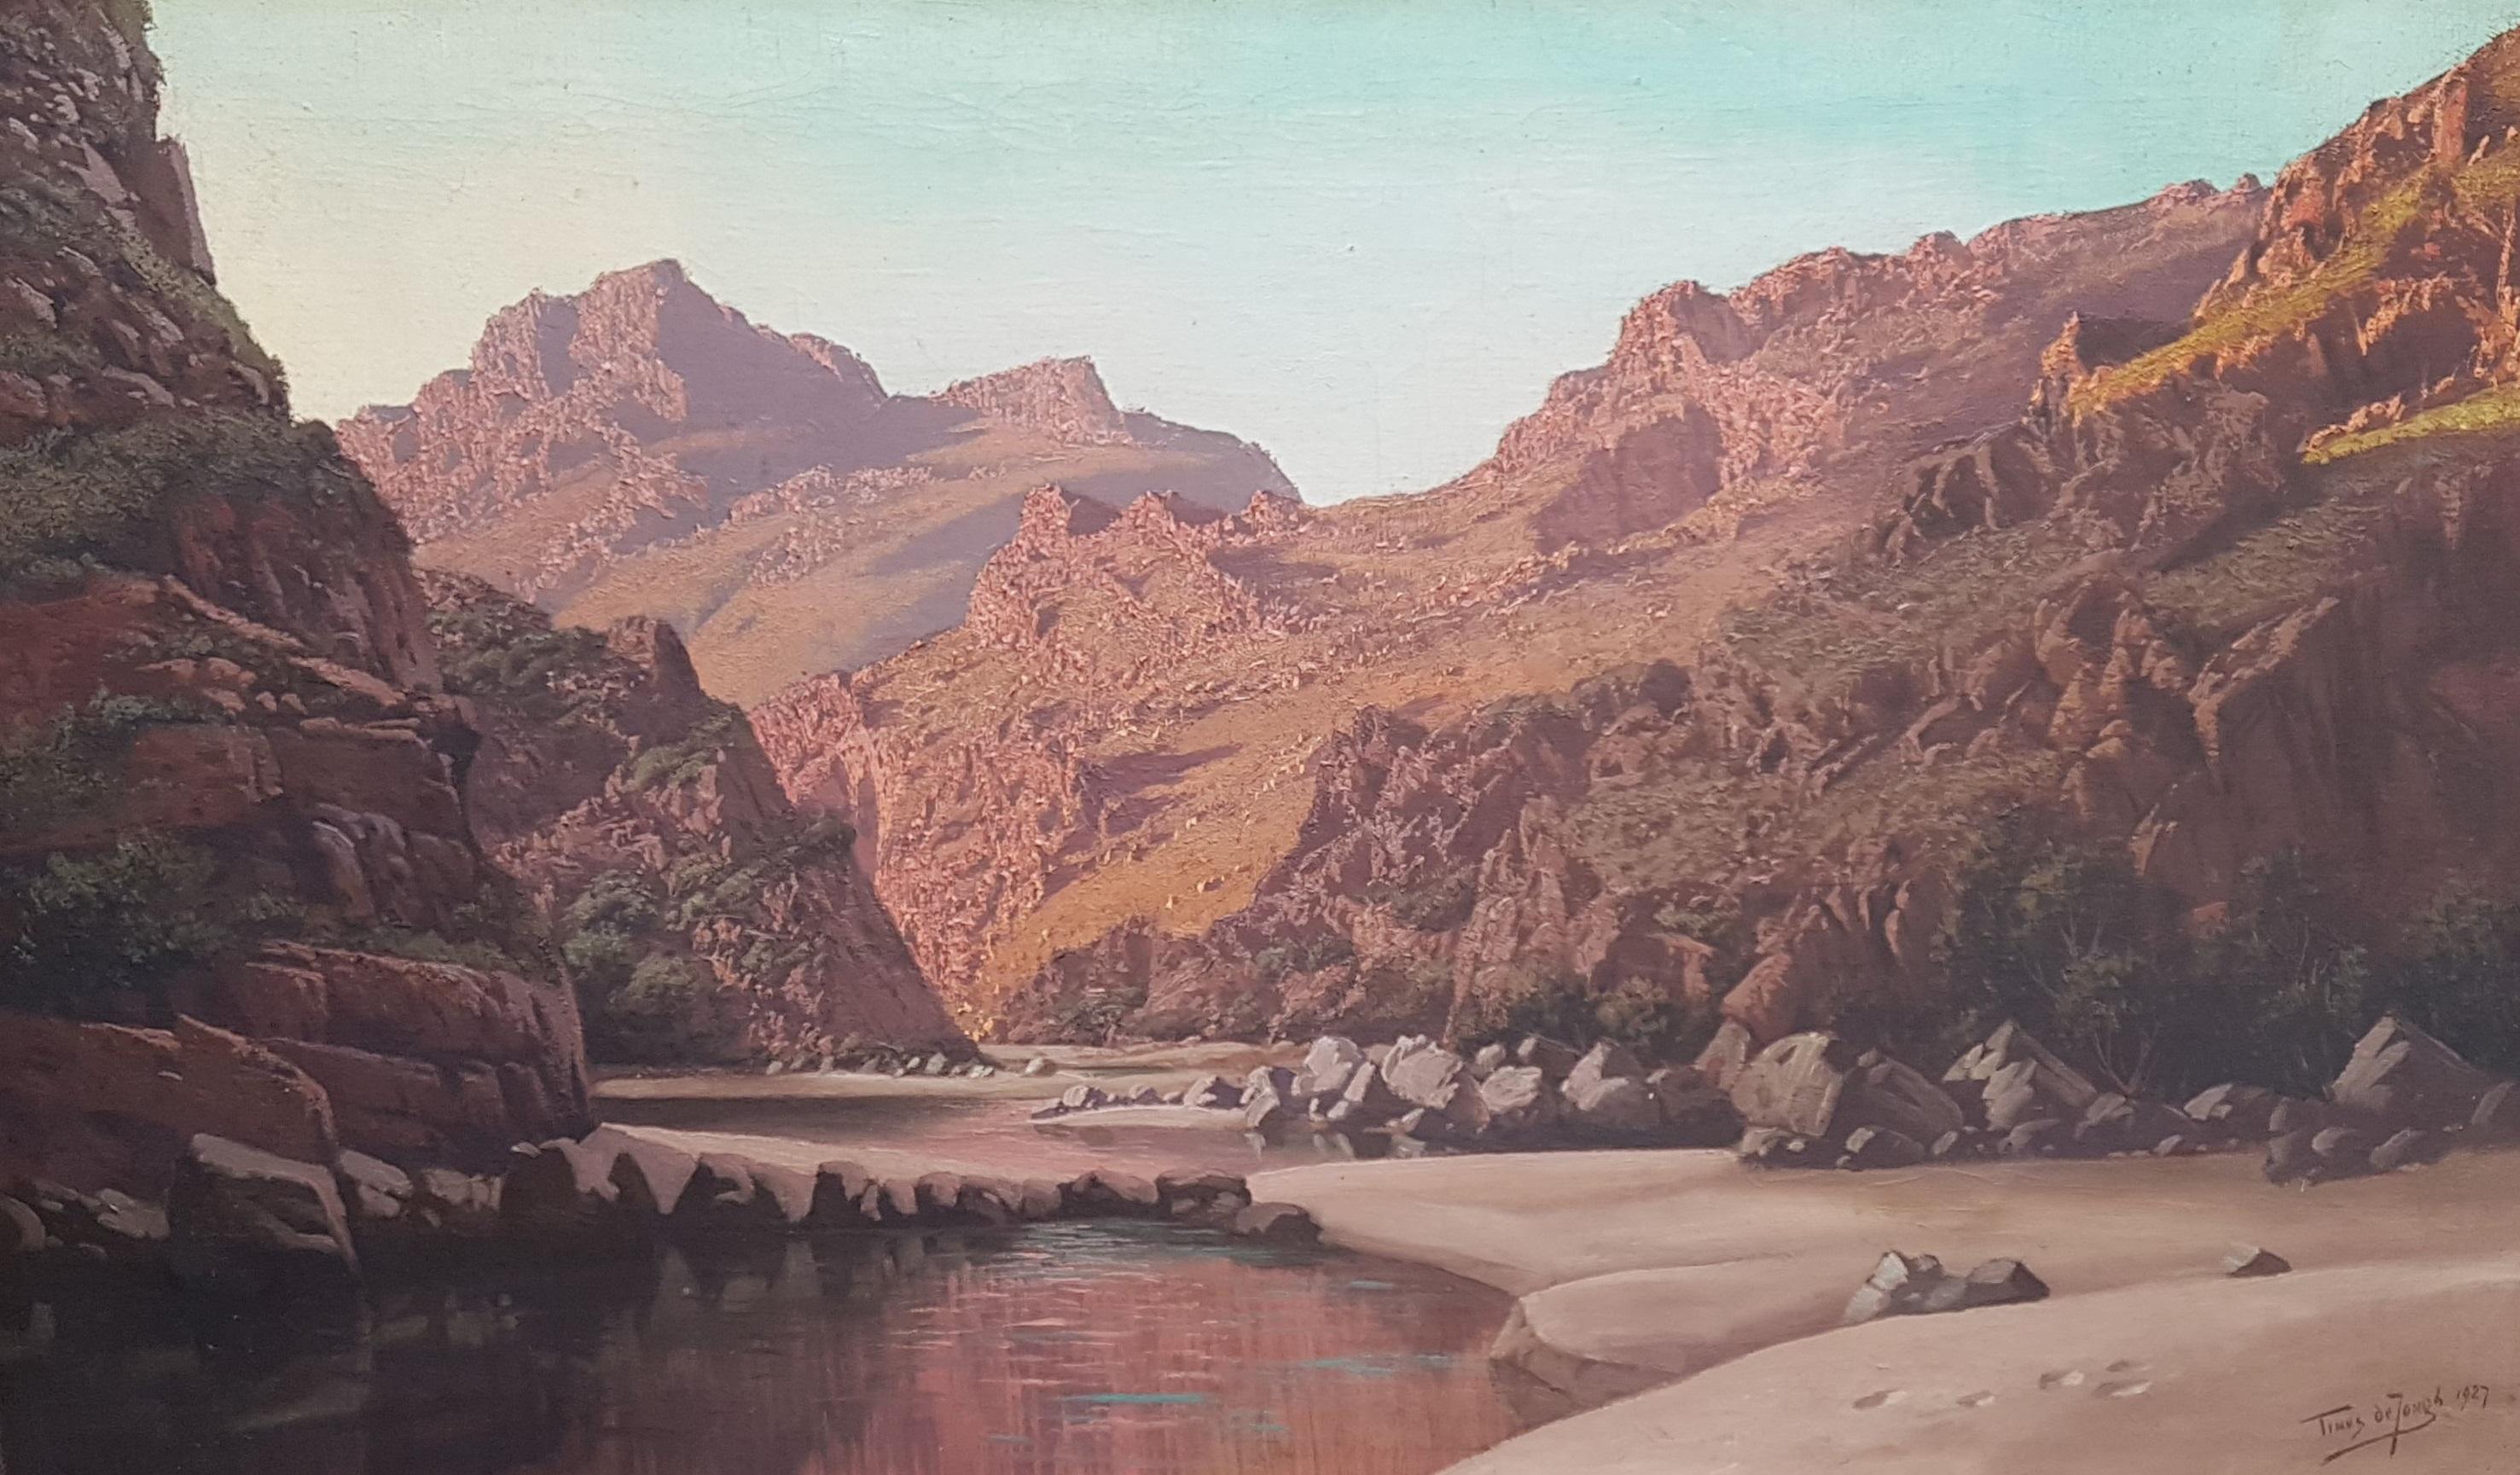 Montagu South Africa (1927)